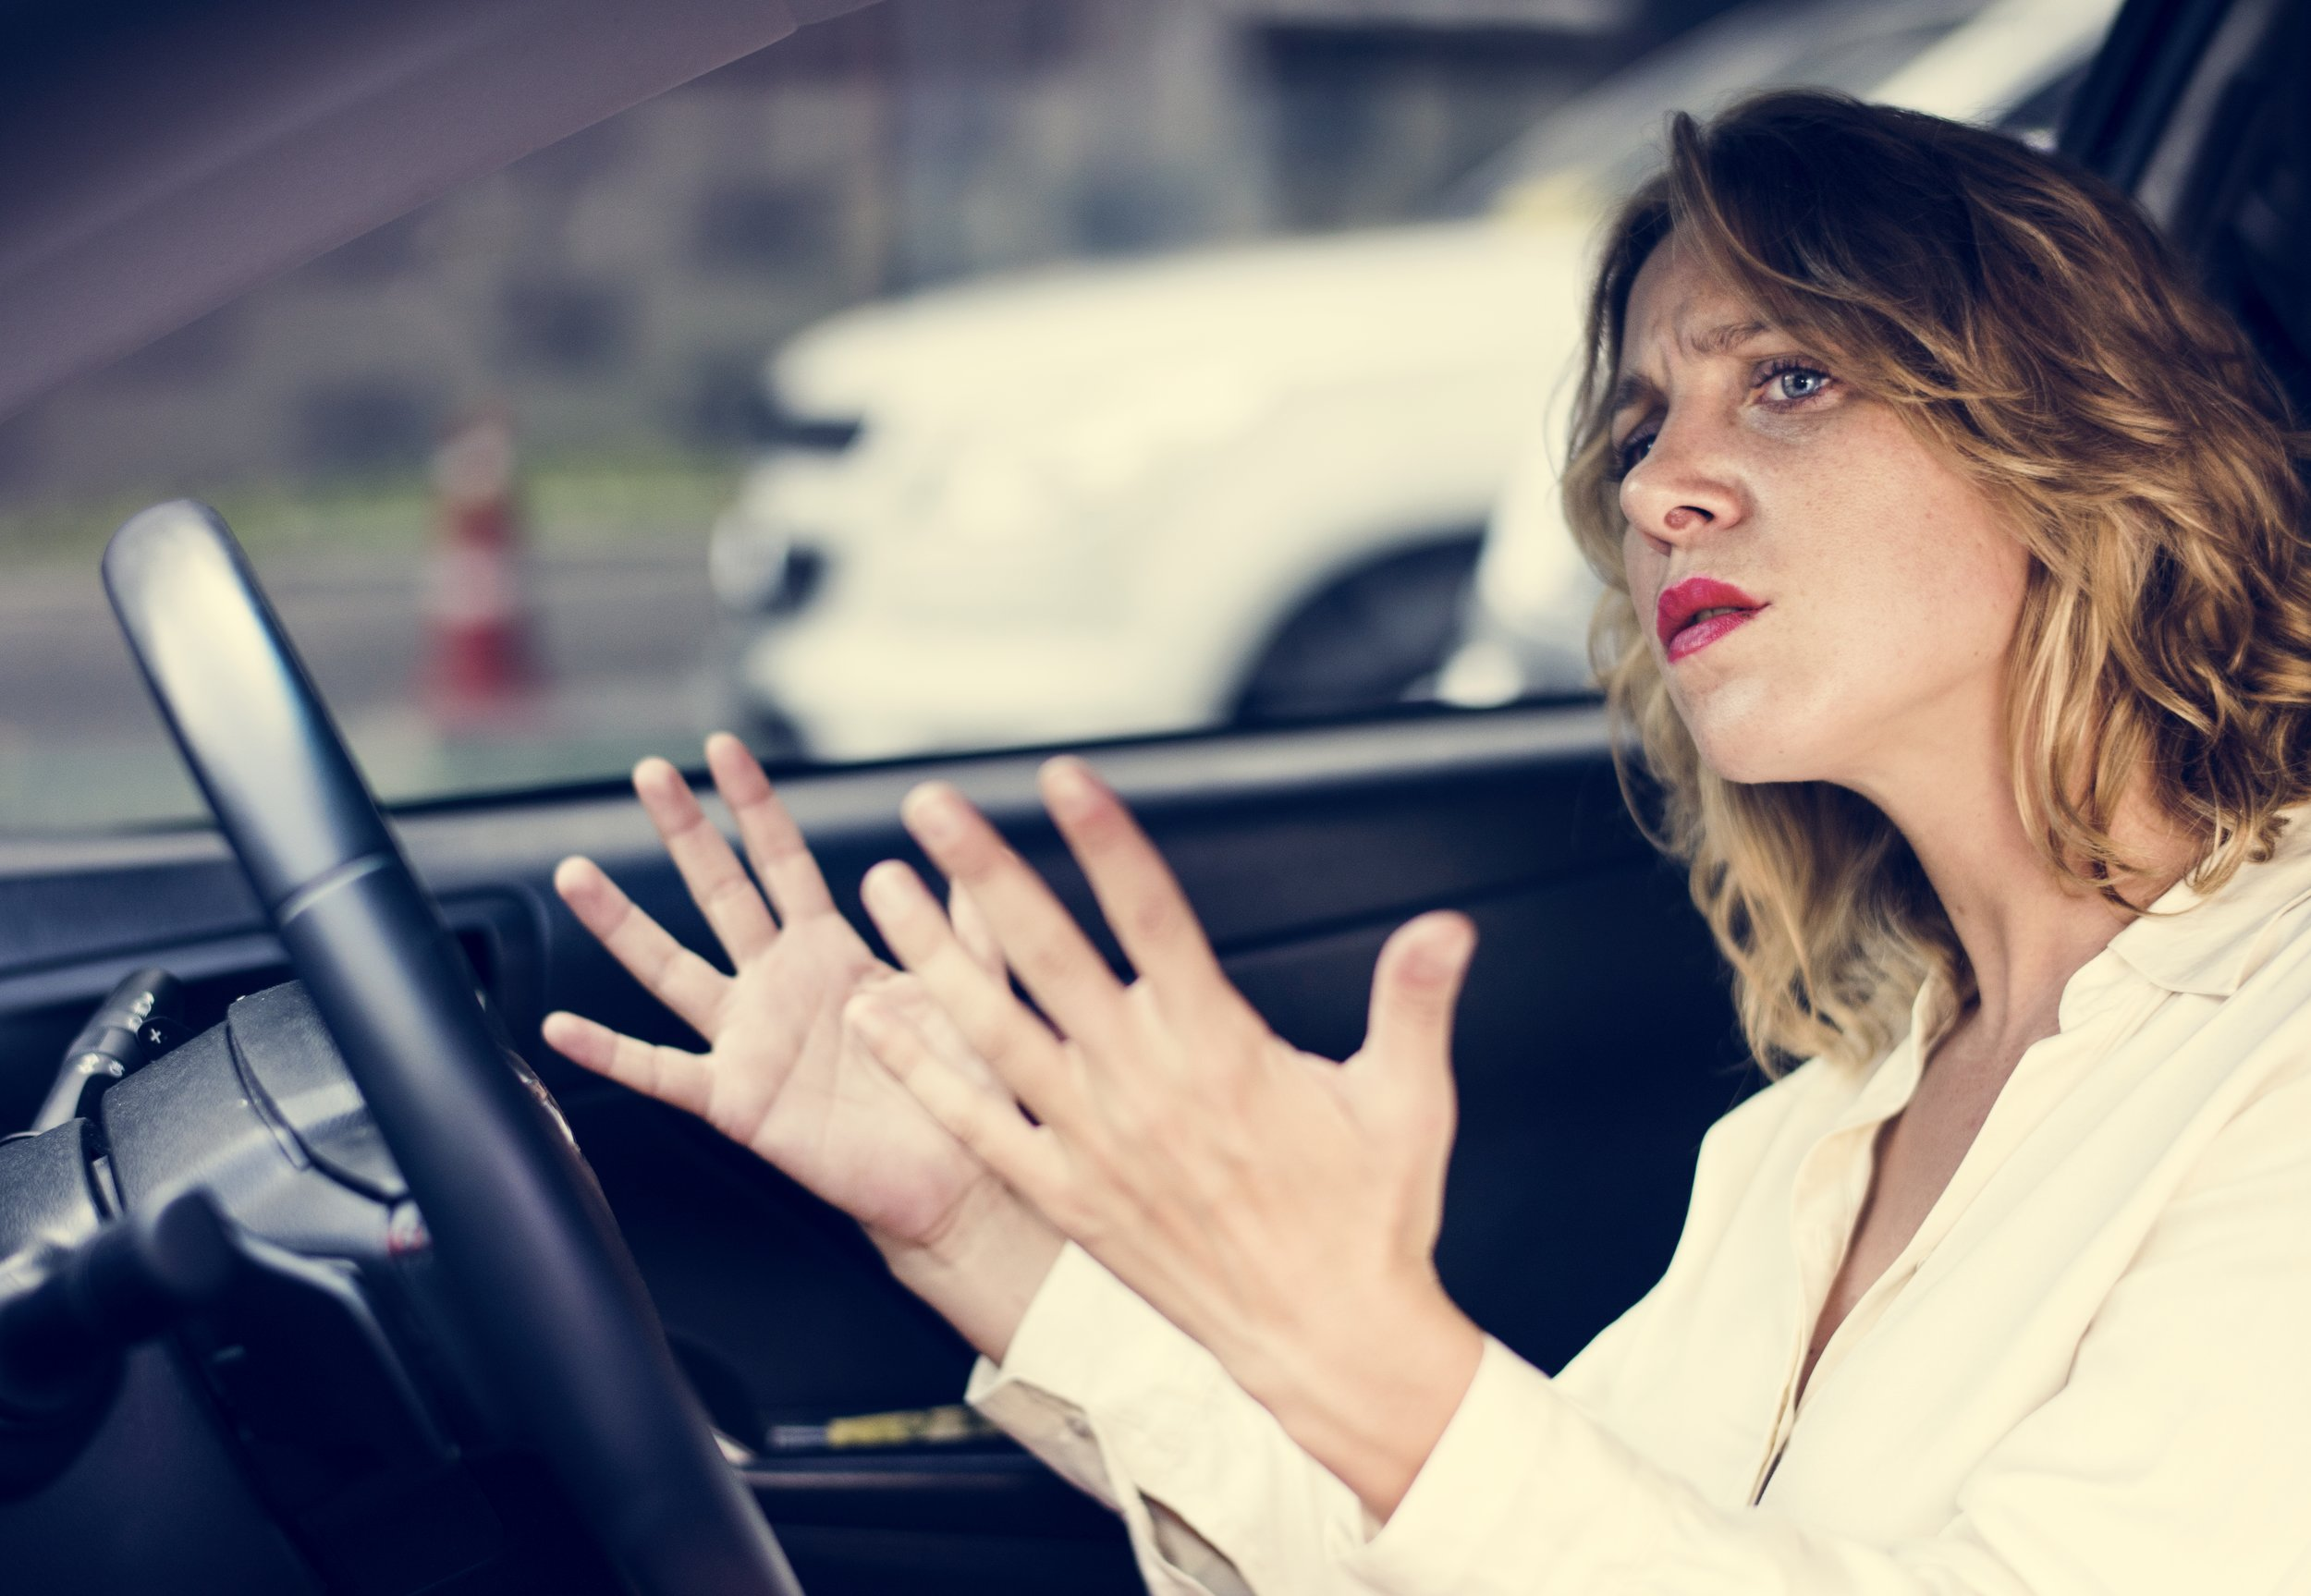 frustrated-woman-stuck-in-traffic-BG436YH.jpg